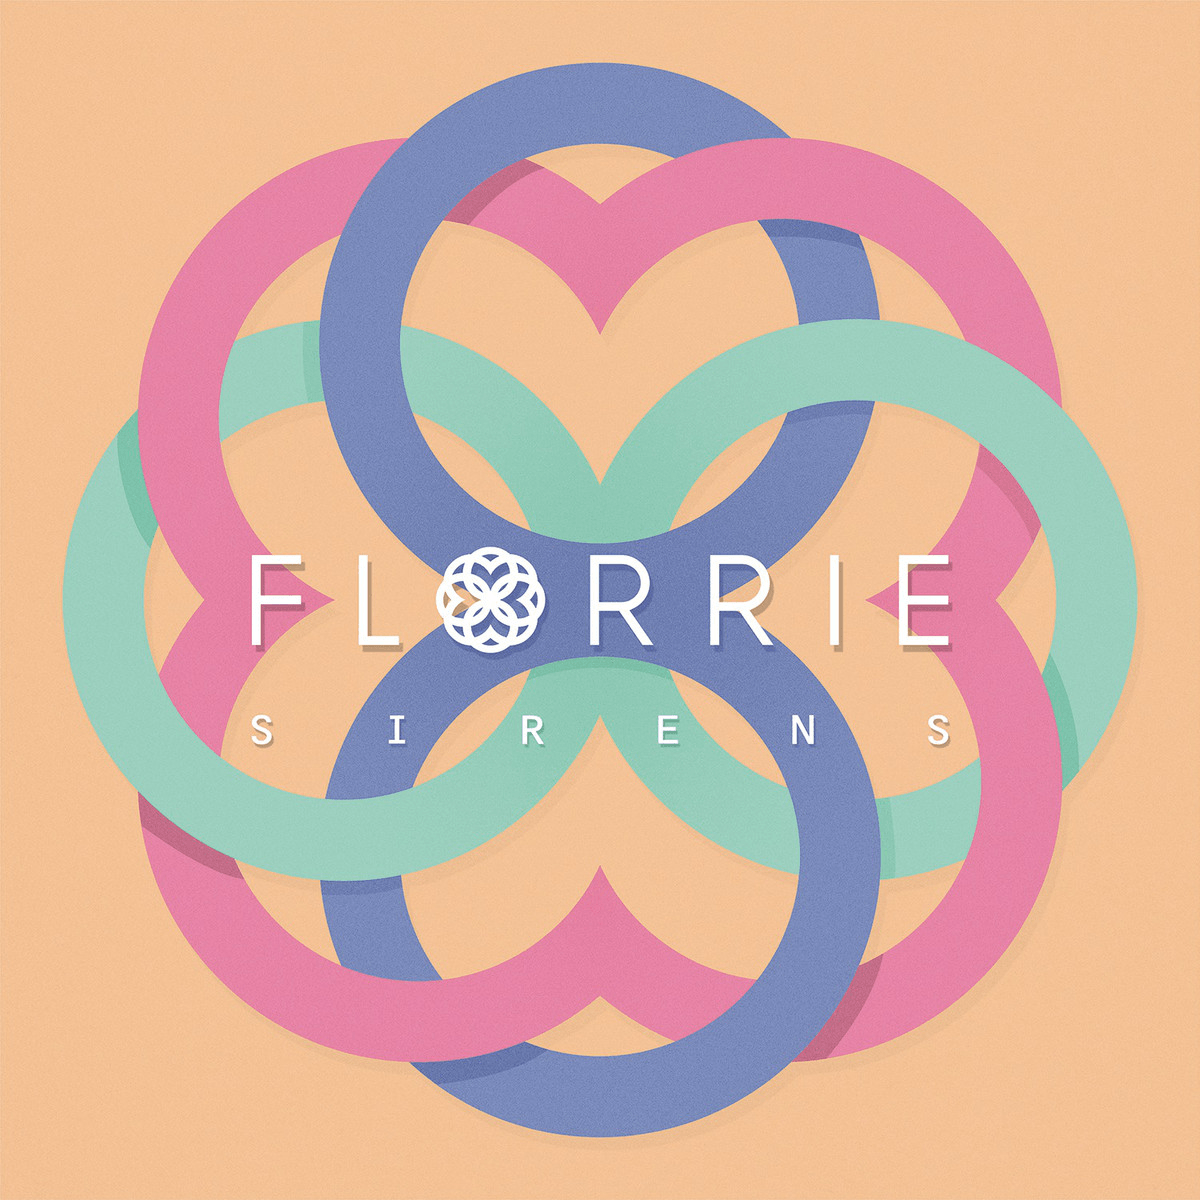 Florrie-Sirens-2014-1200x1200